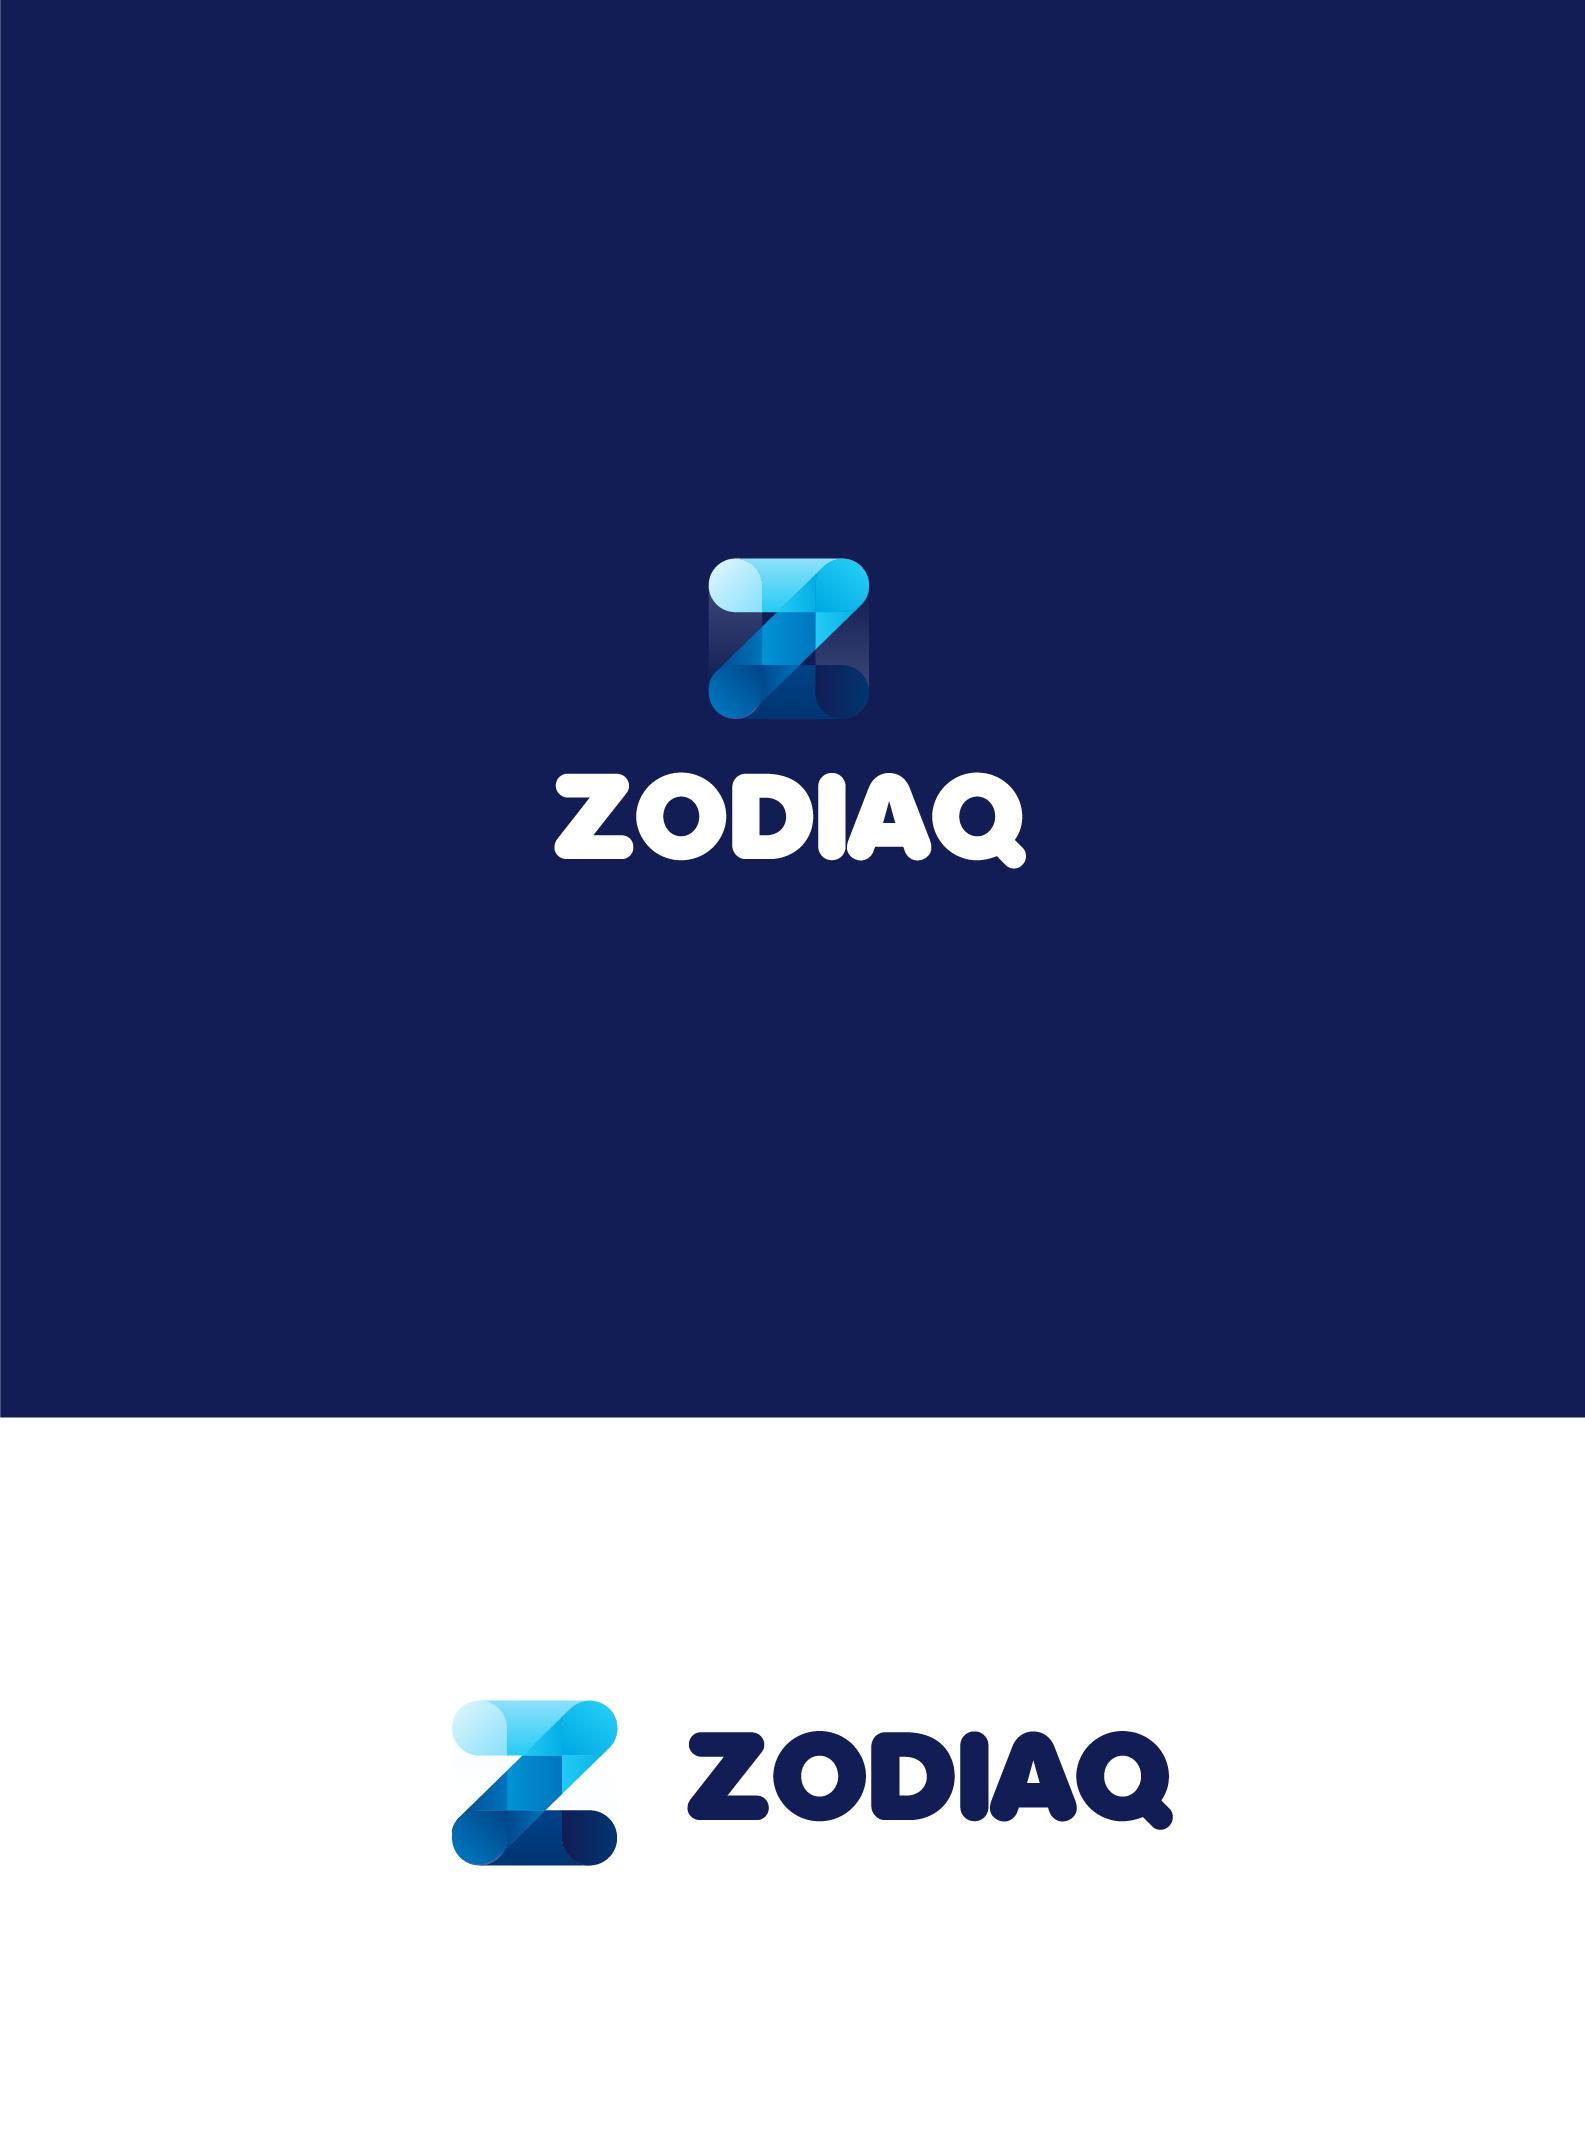 Разработка логотипа и основных элементов стиля фото f_27359904b1522dae.jpg